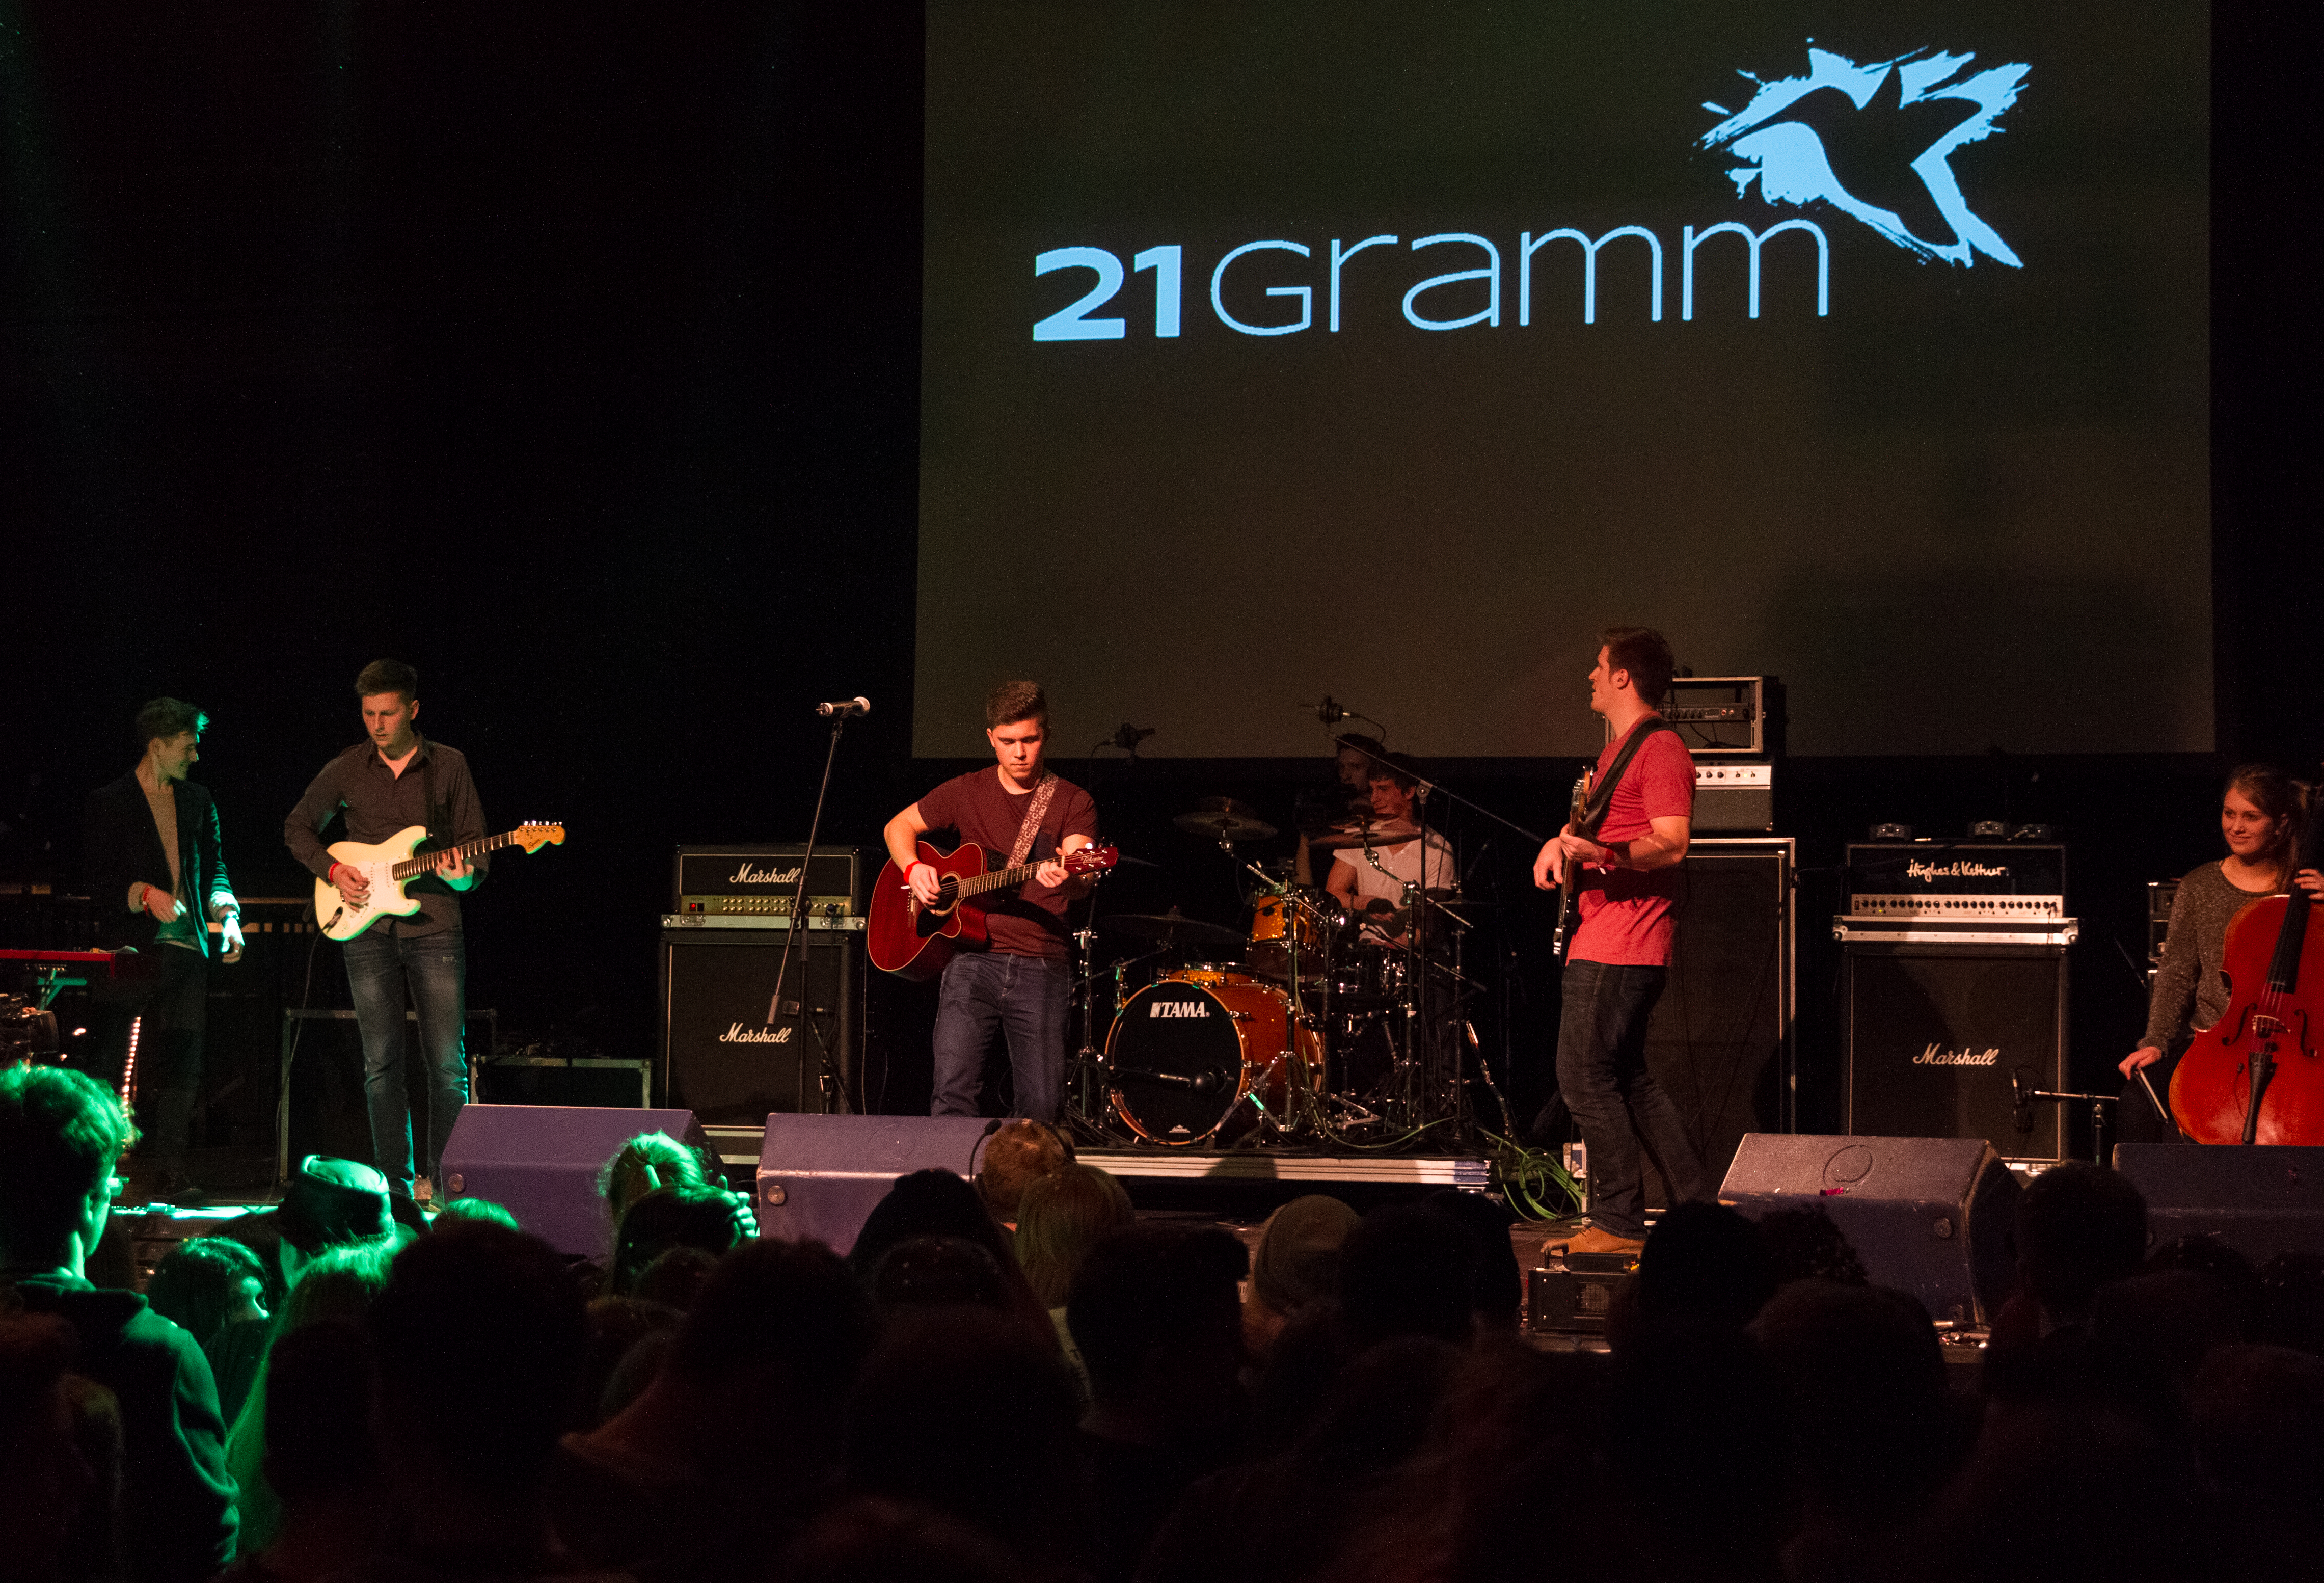 file21 gramm sch252ler rockfestival 20156635jpg